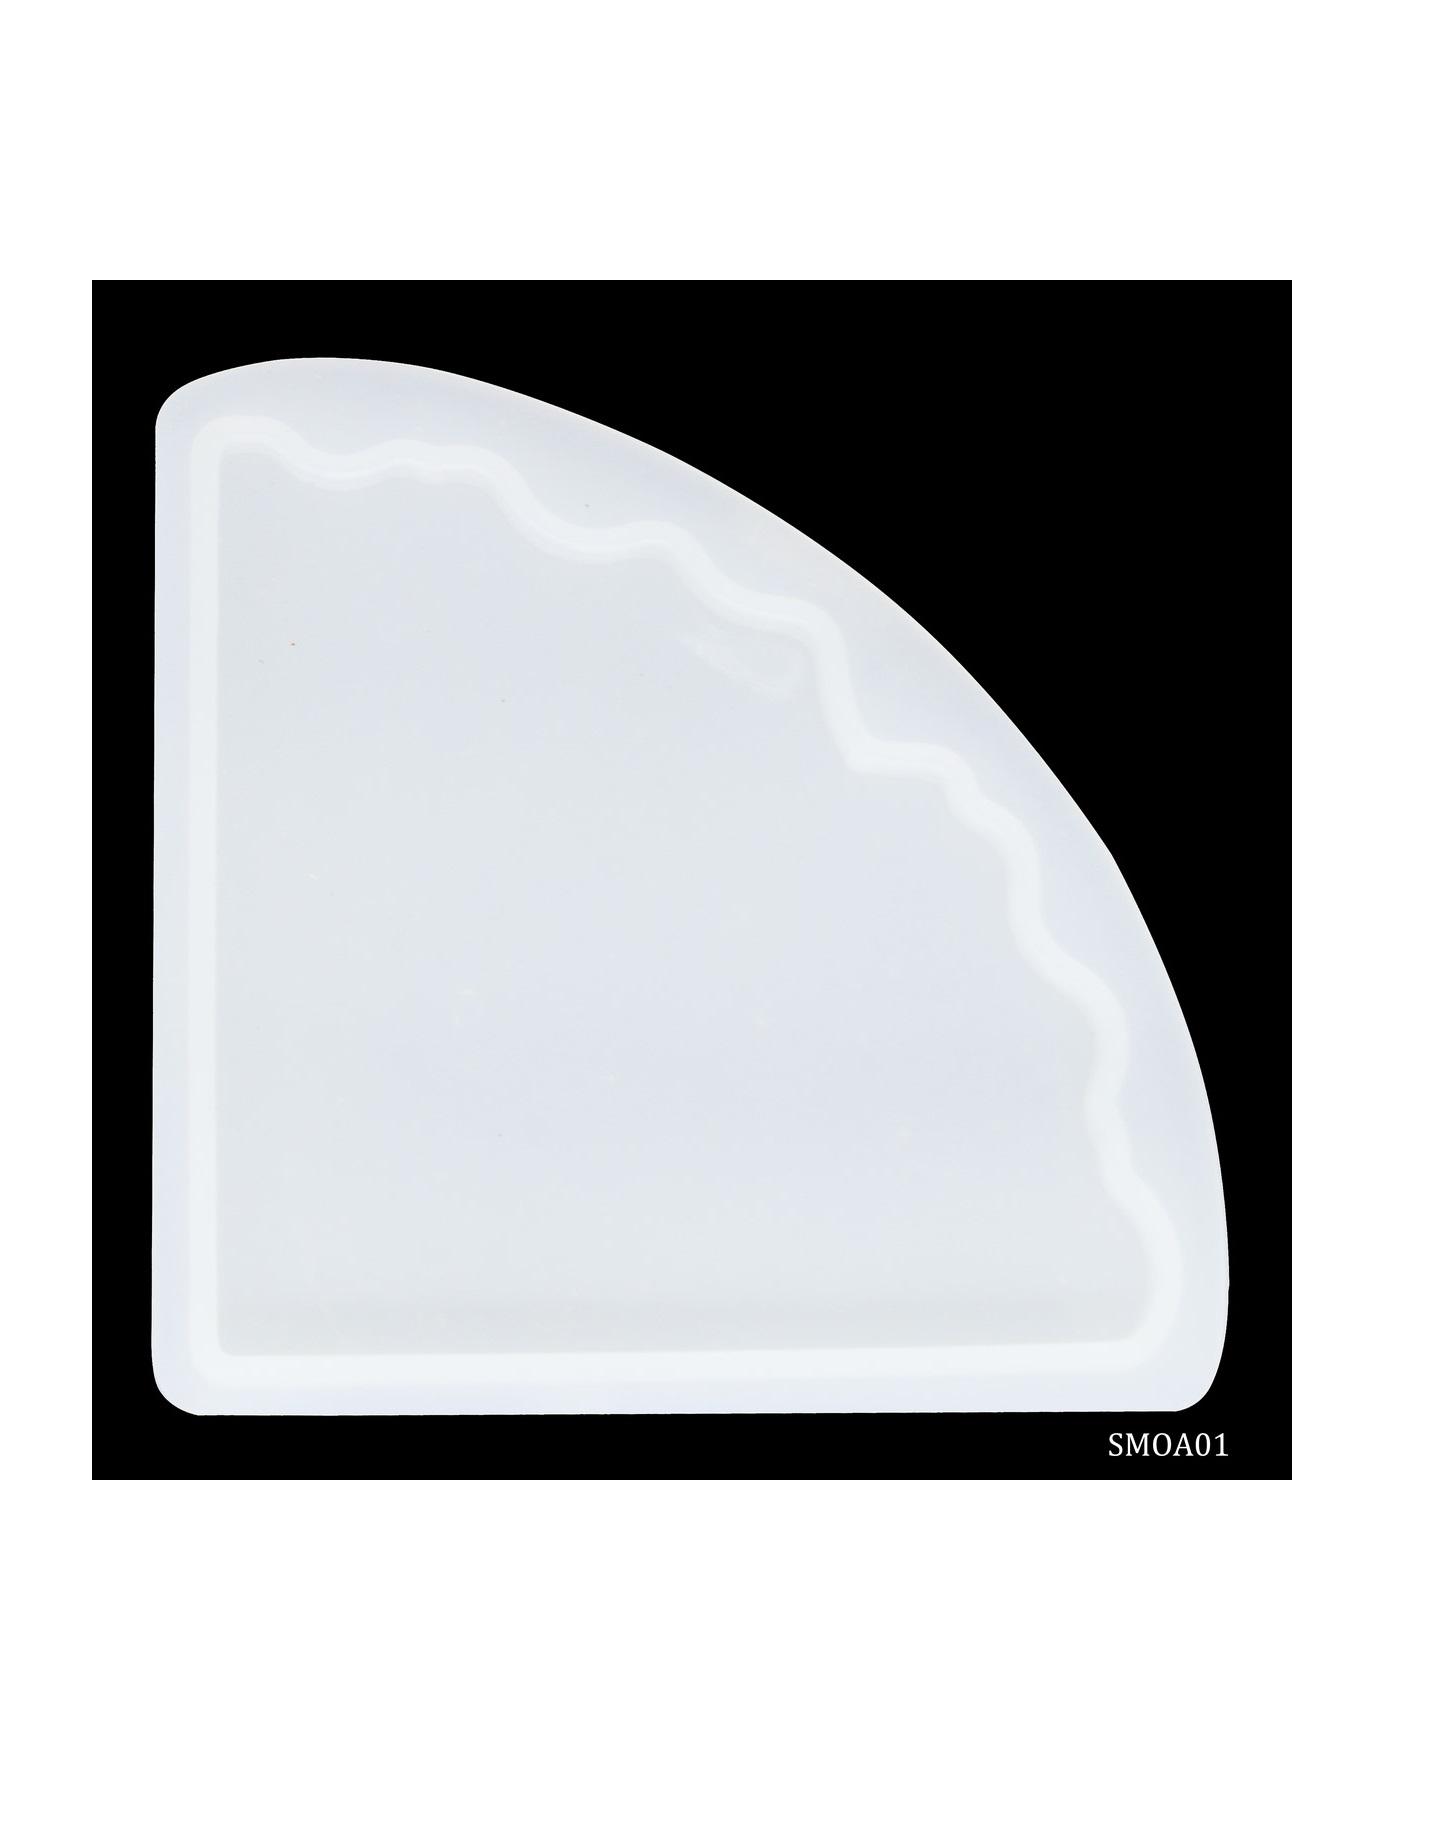 Silicone Mould Agate One Coaster Corner SMOA01